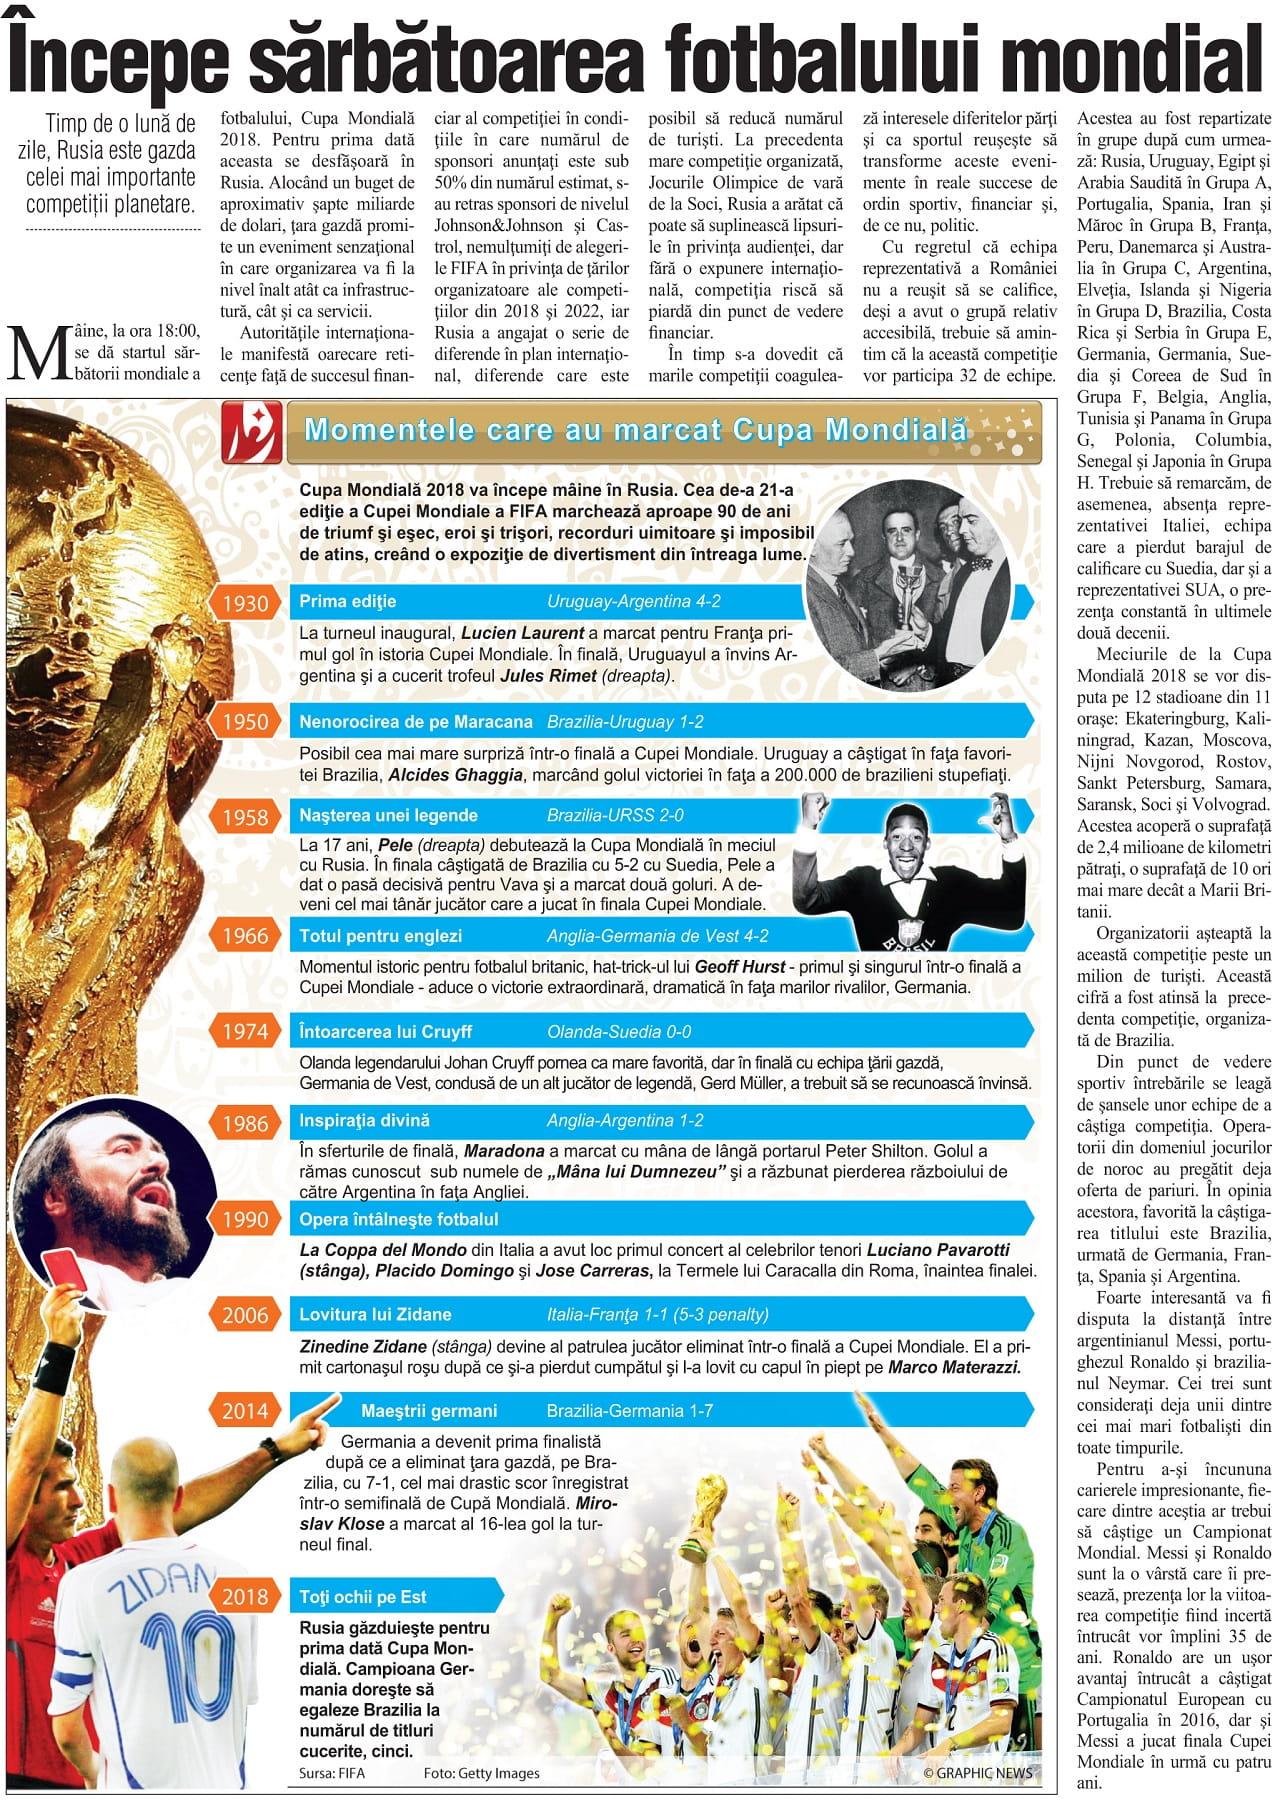 Cupa Mondiala - sarbatoarea fotbalului mondial